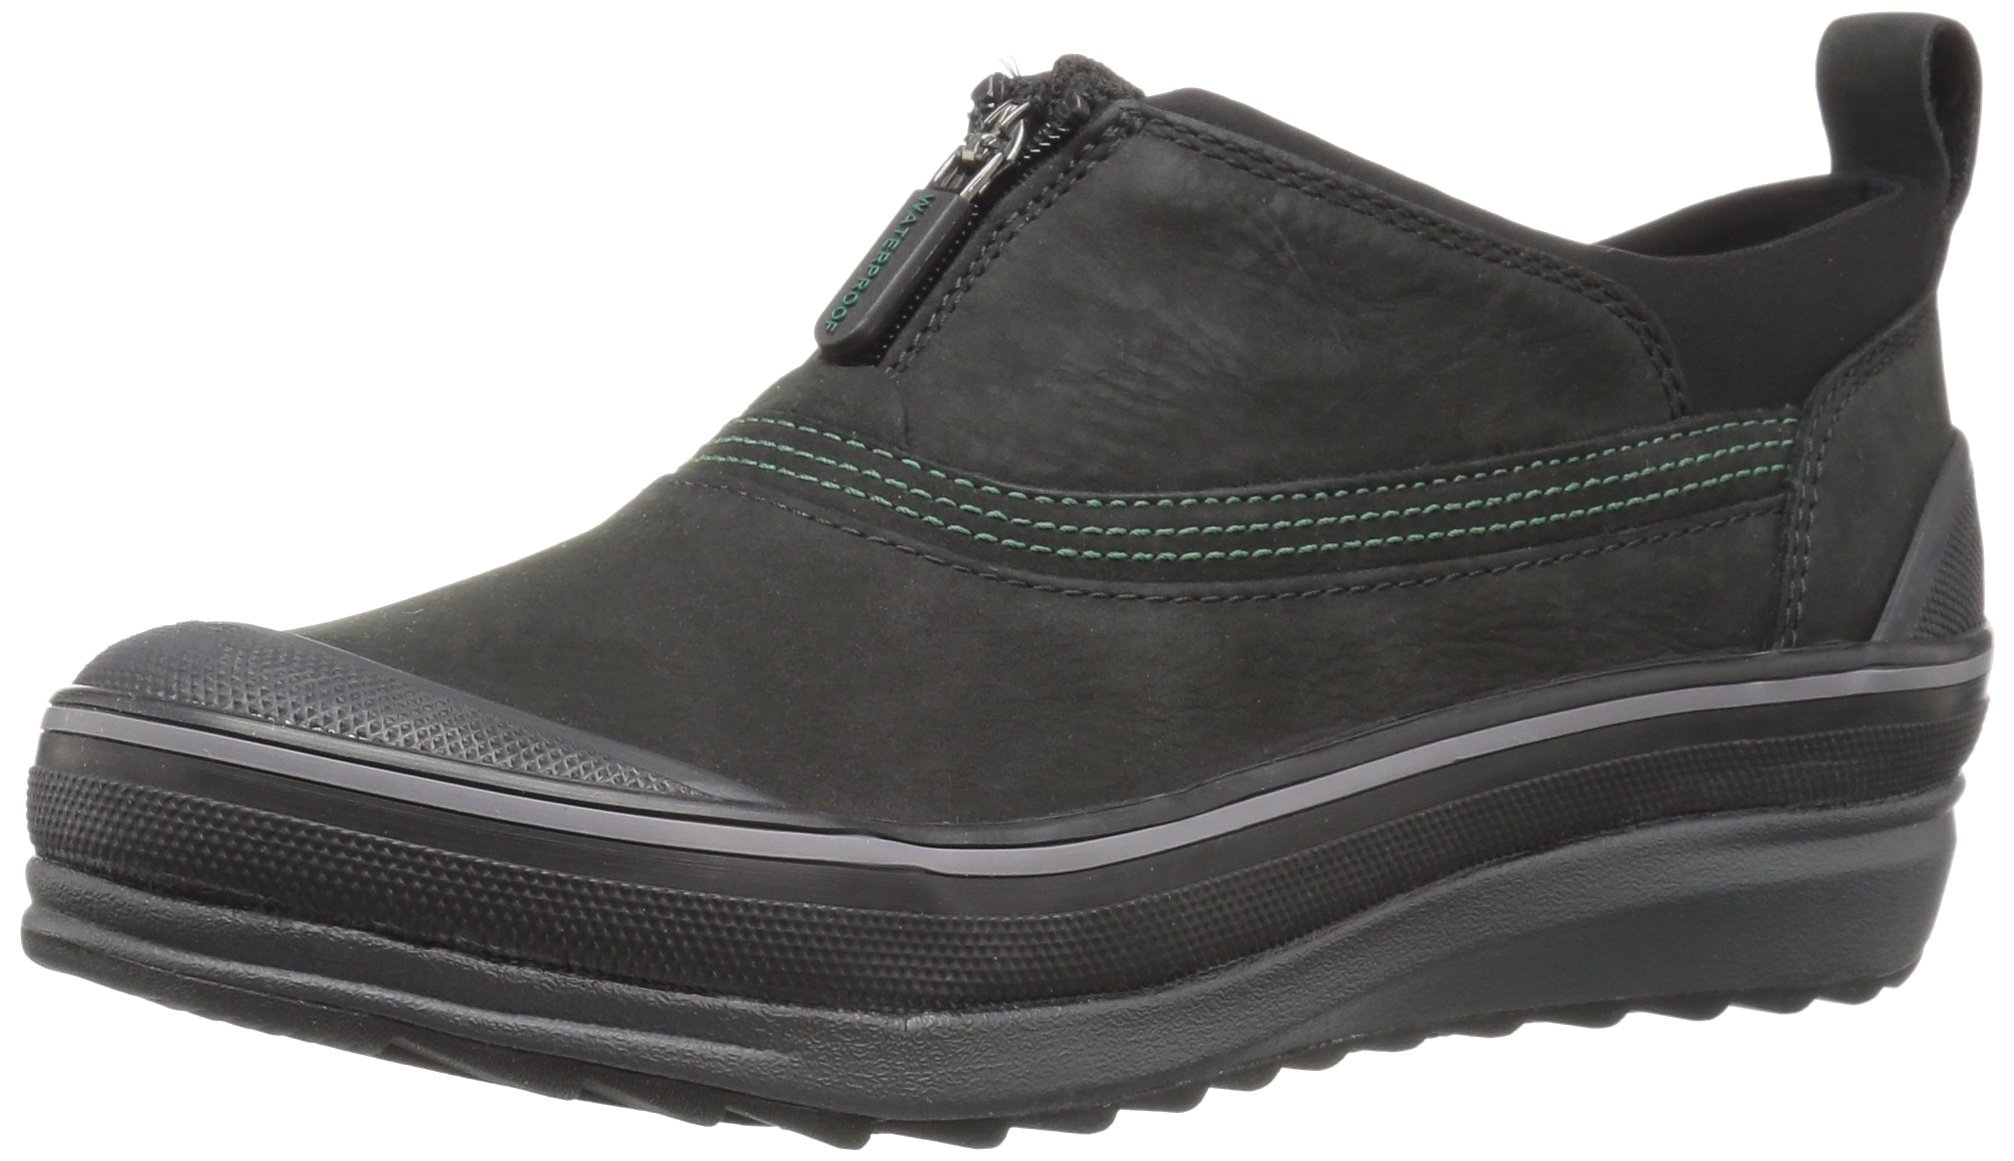 Clarks Women's Muckers Ruck Rain Shoe, Black Nubuck, 6.5 M US